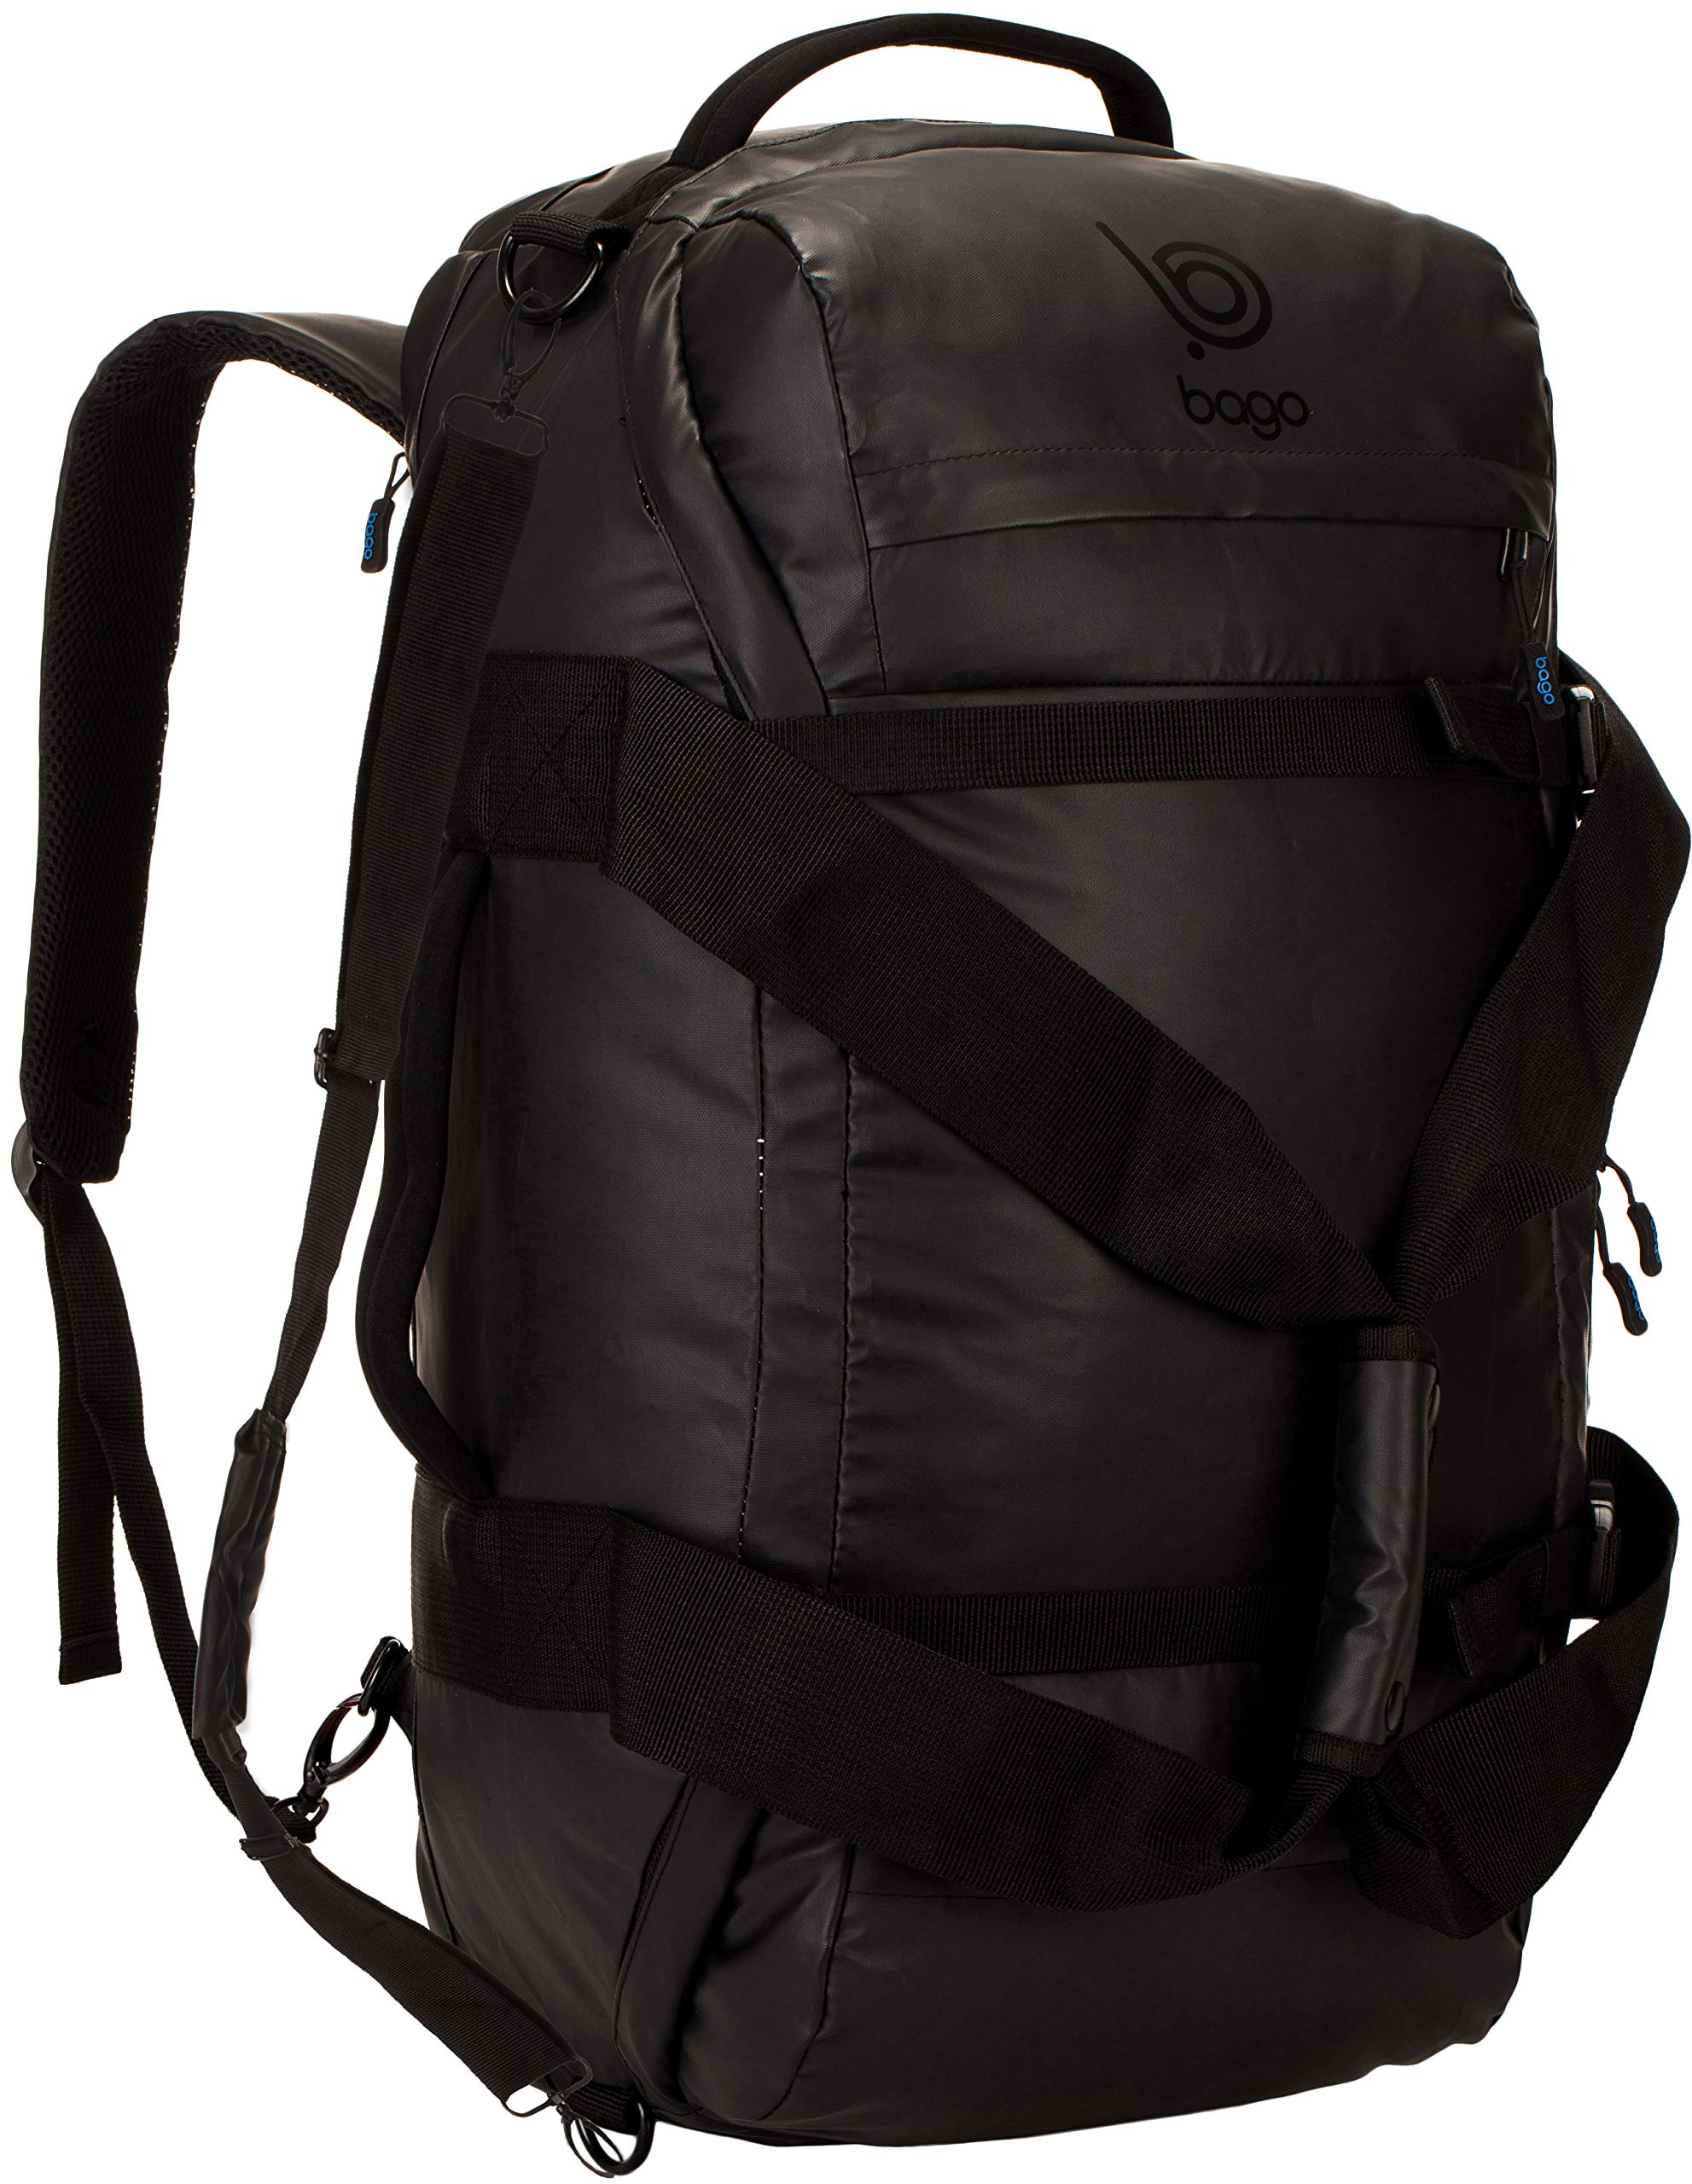 bago Carry on Traveling Backpack Duffle Bag - 3 Way Duffel Backpack for Travel & Sports - Waterproof Heavy Duty Gear Bag for Men & Women (Black) by bago